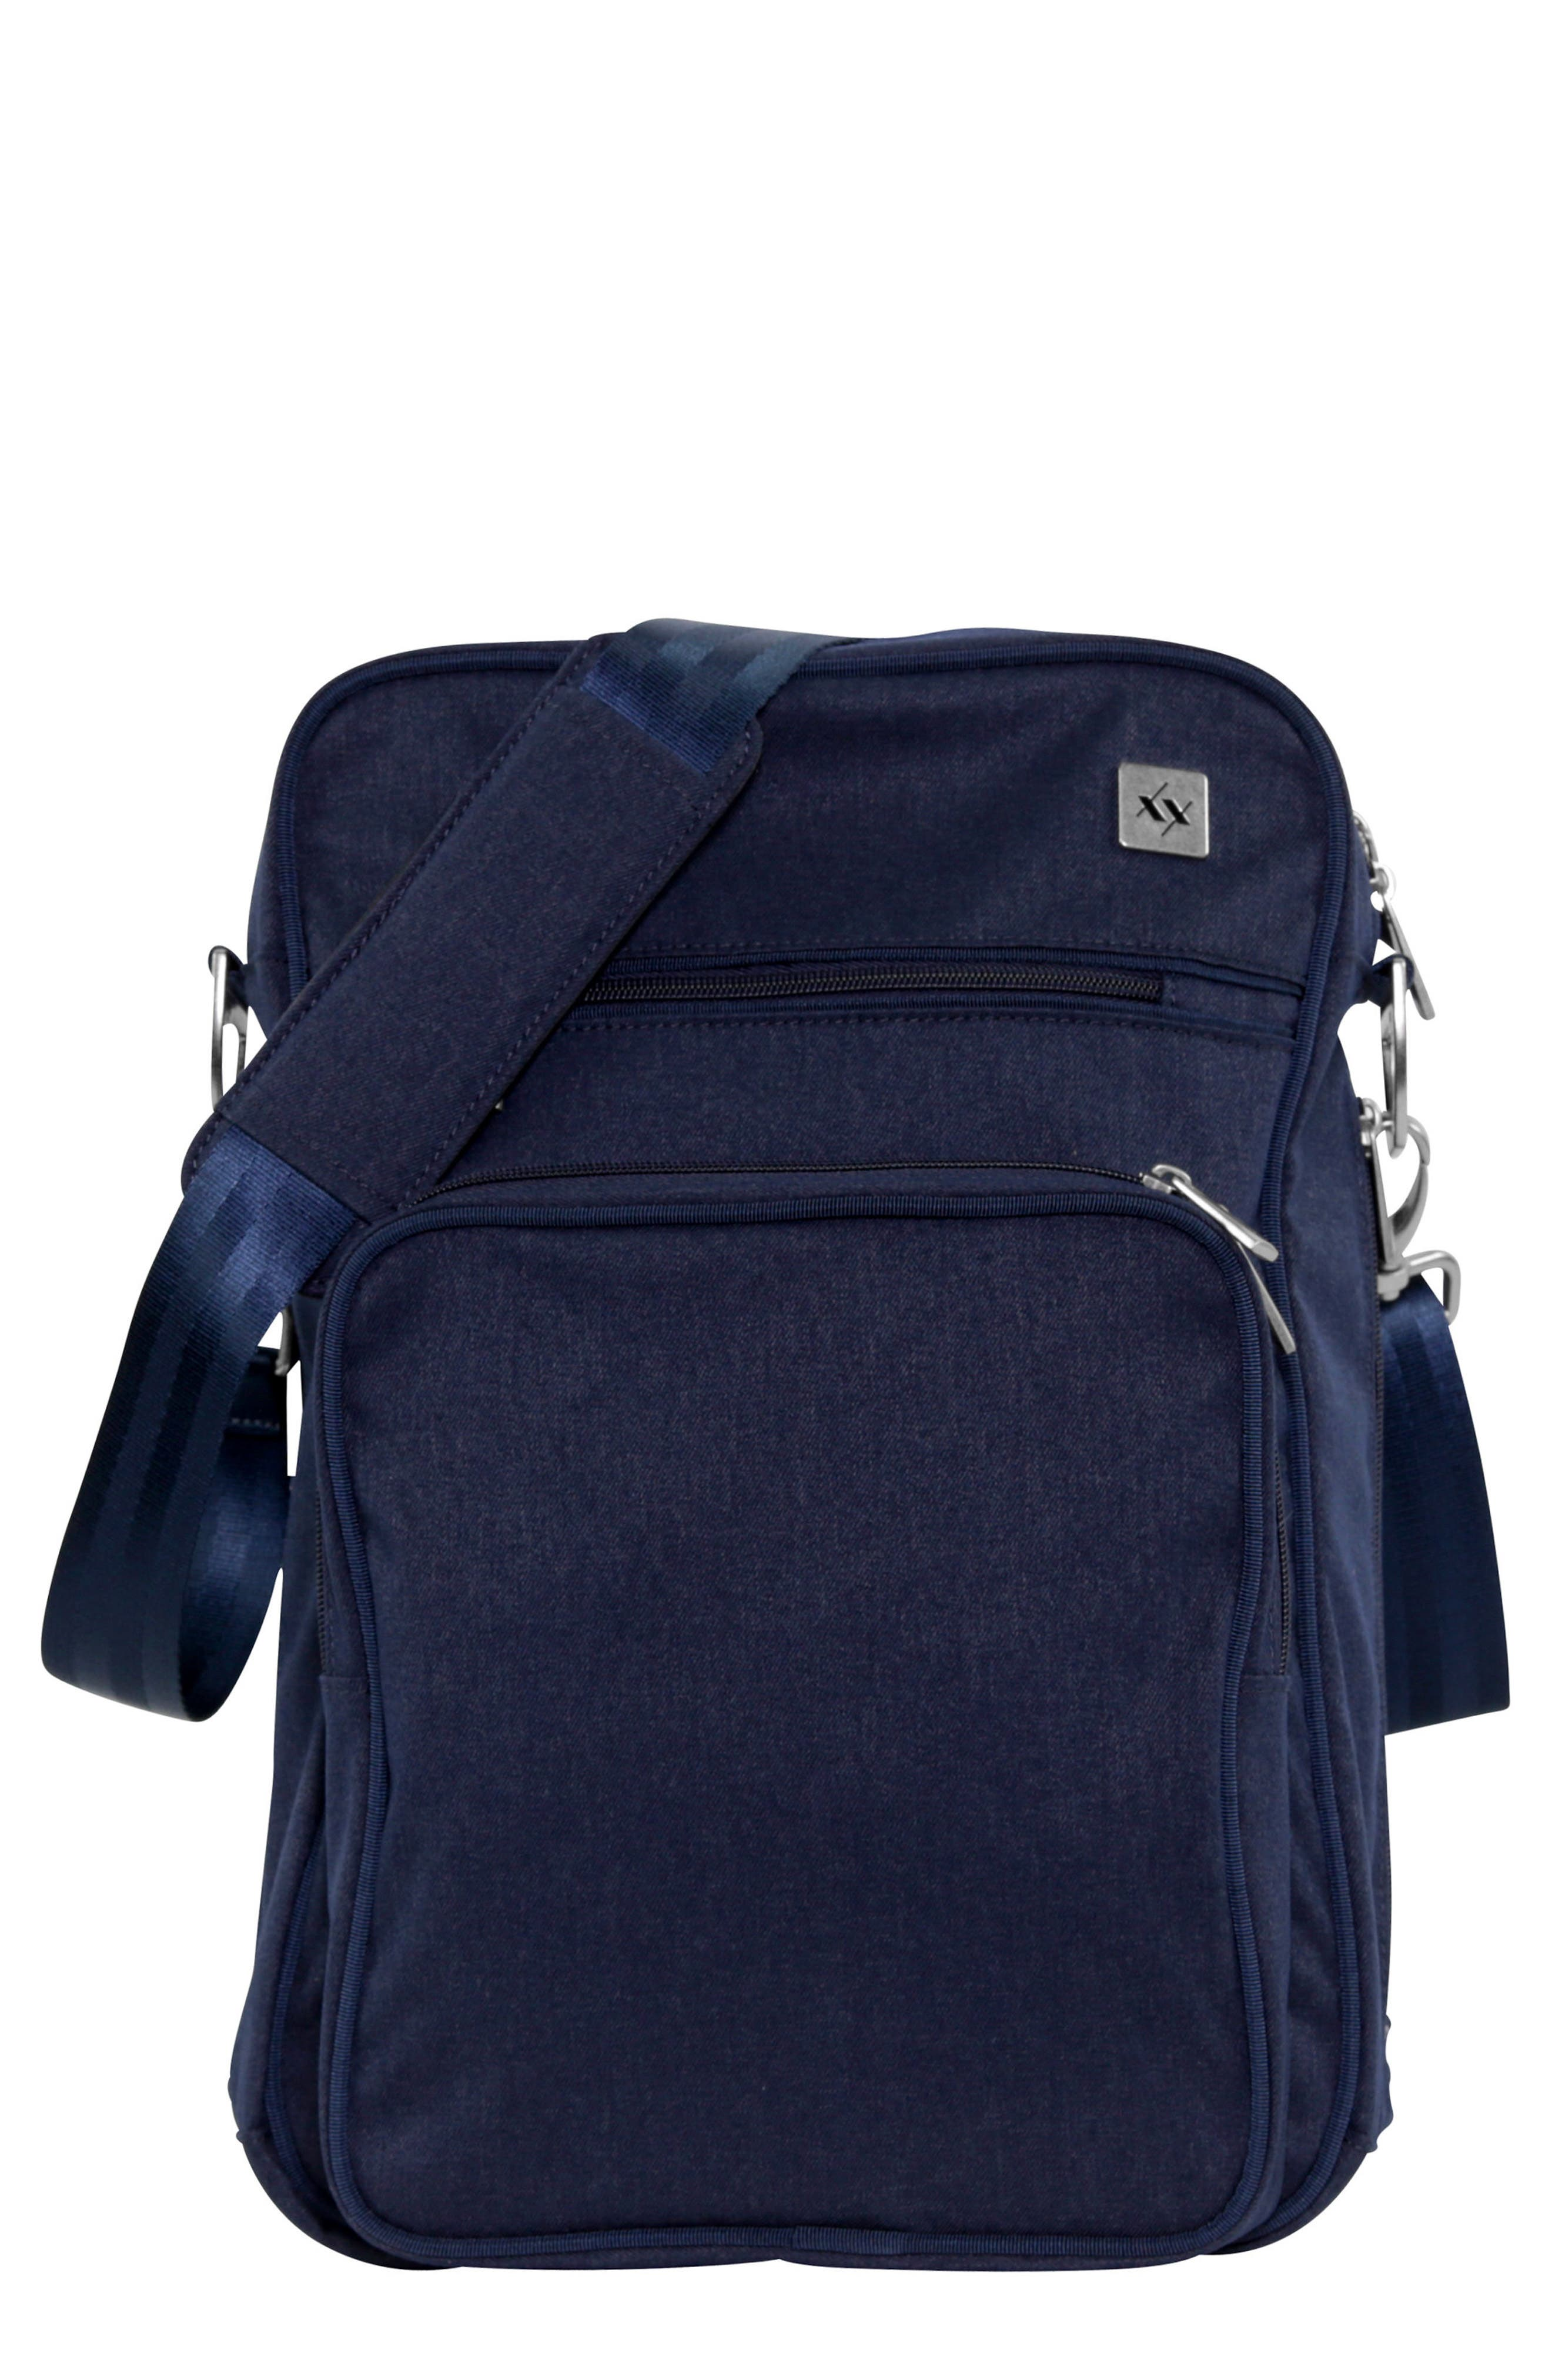 Ju-Ju-Be Helix Onyx Collection Messenger Diaper Bag